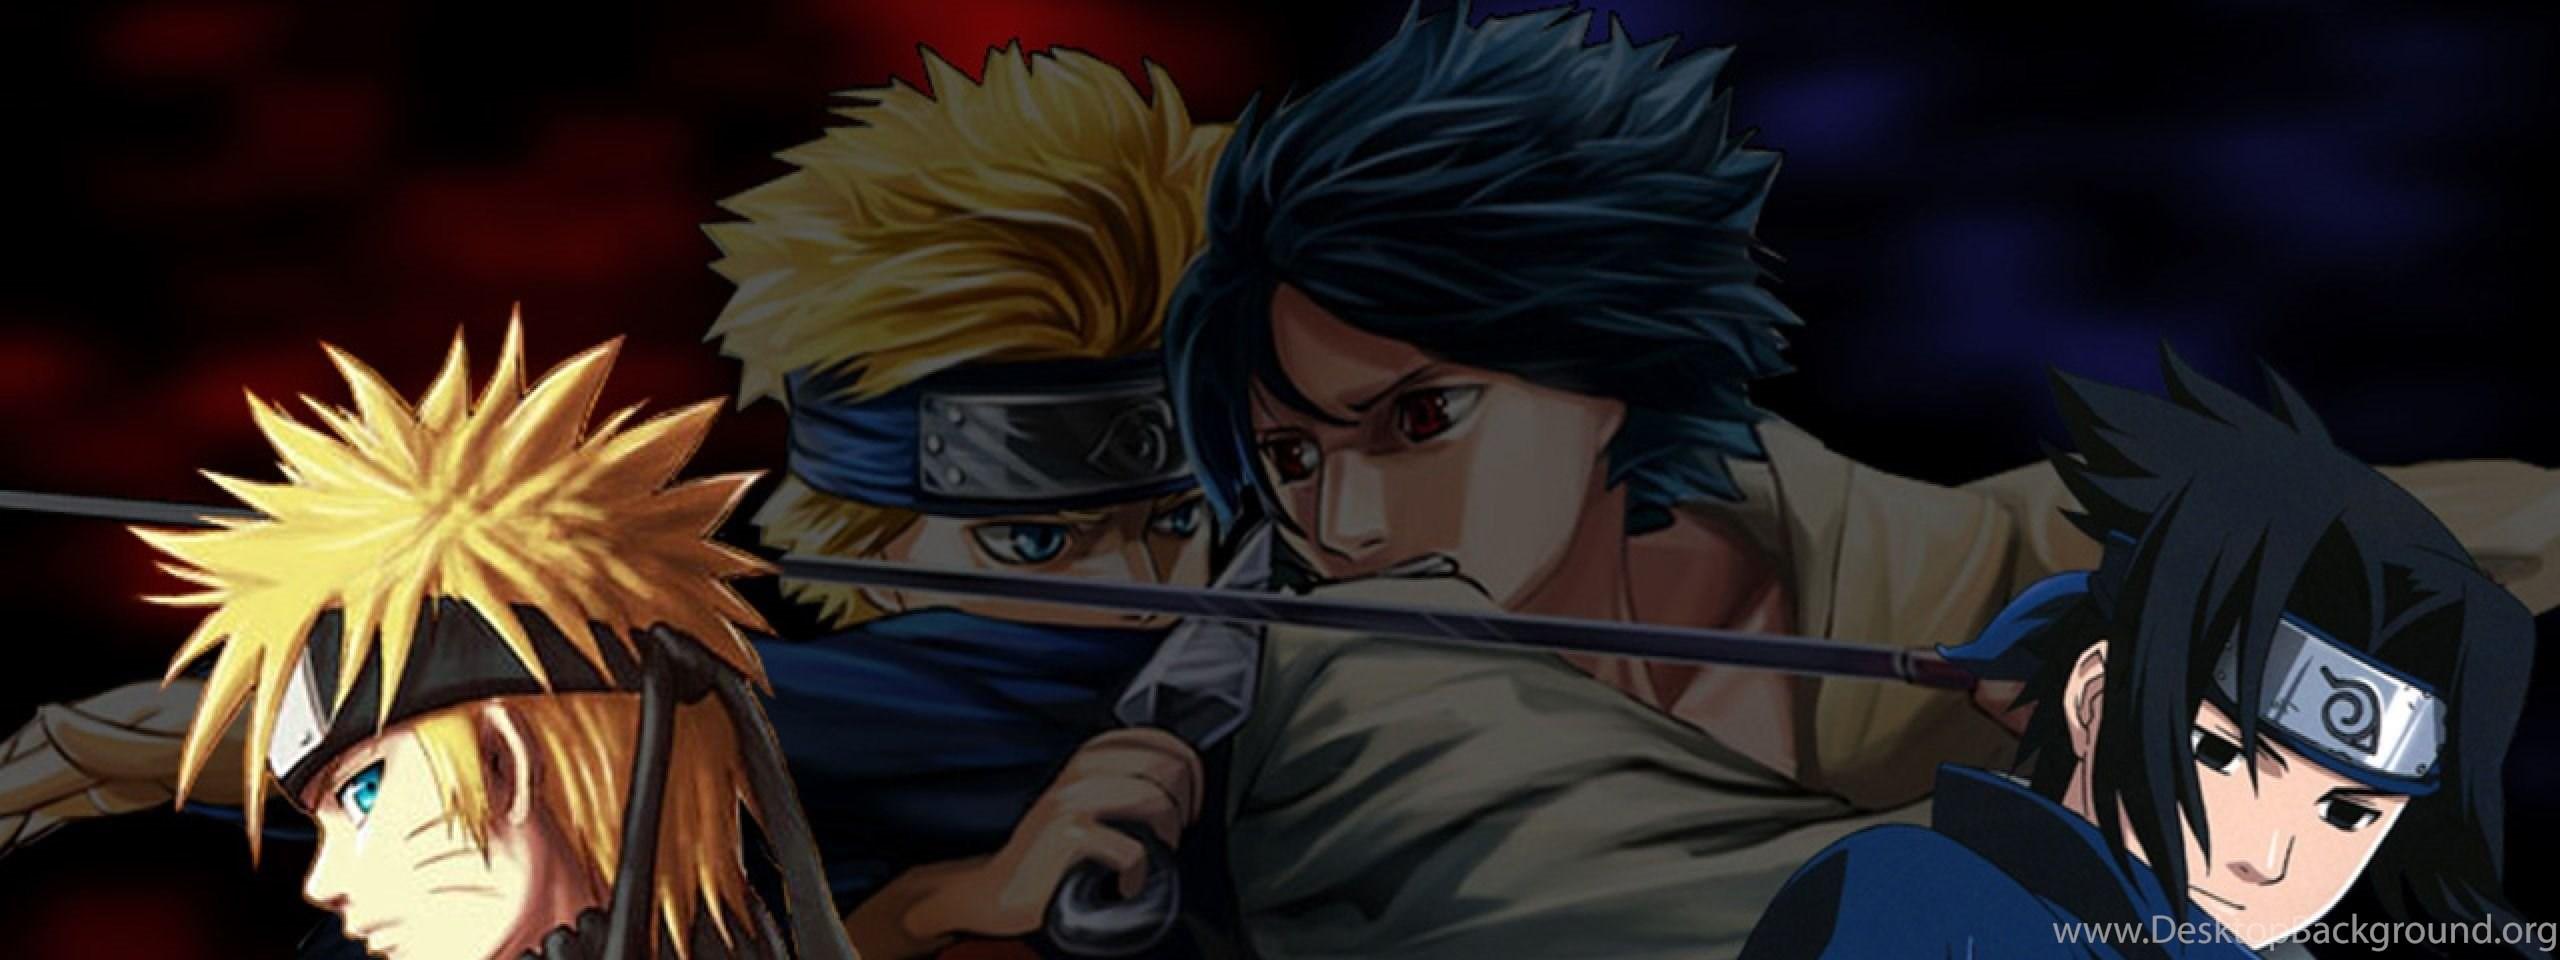 Download Wallpapers 2560x1024 Naruto Vs Sasuke Guys Quarrel